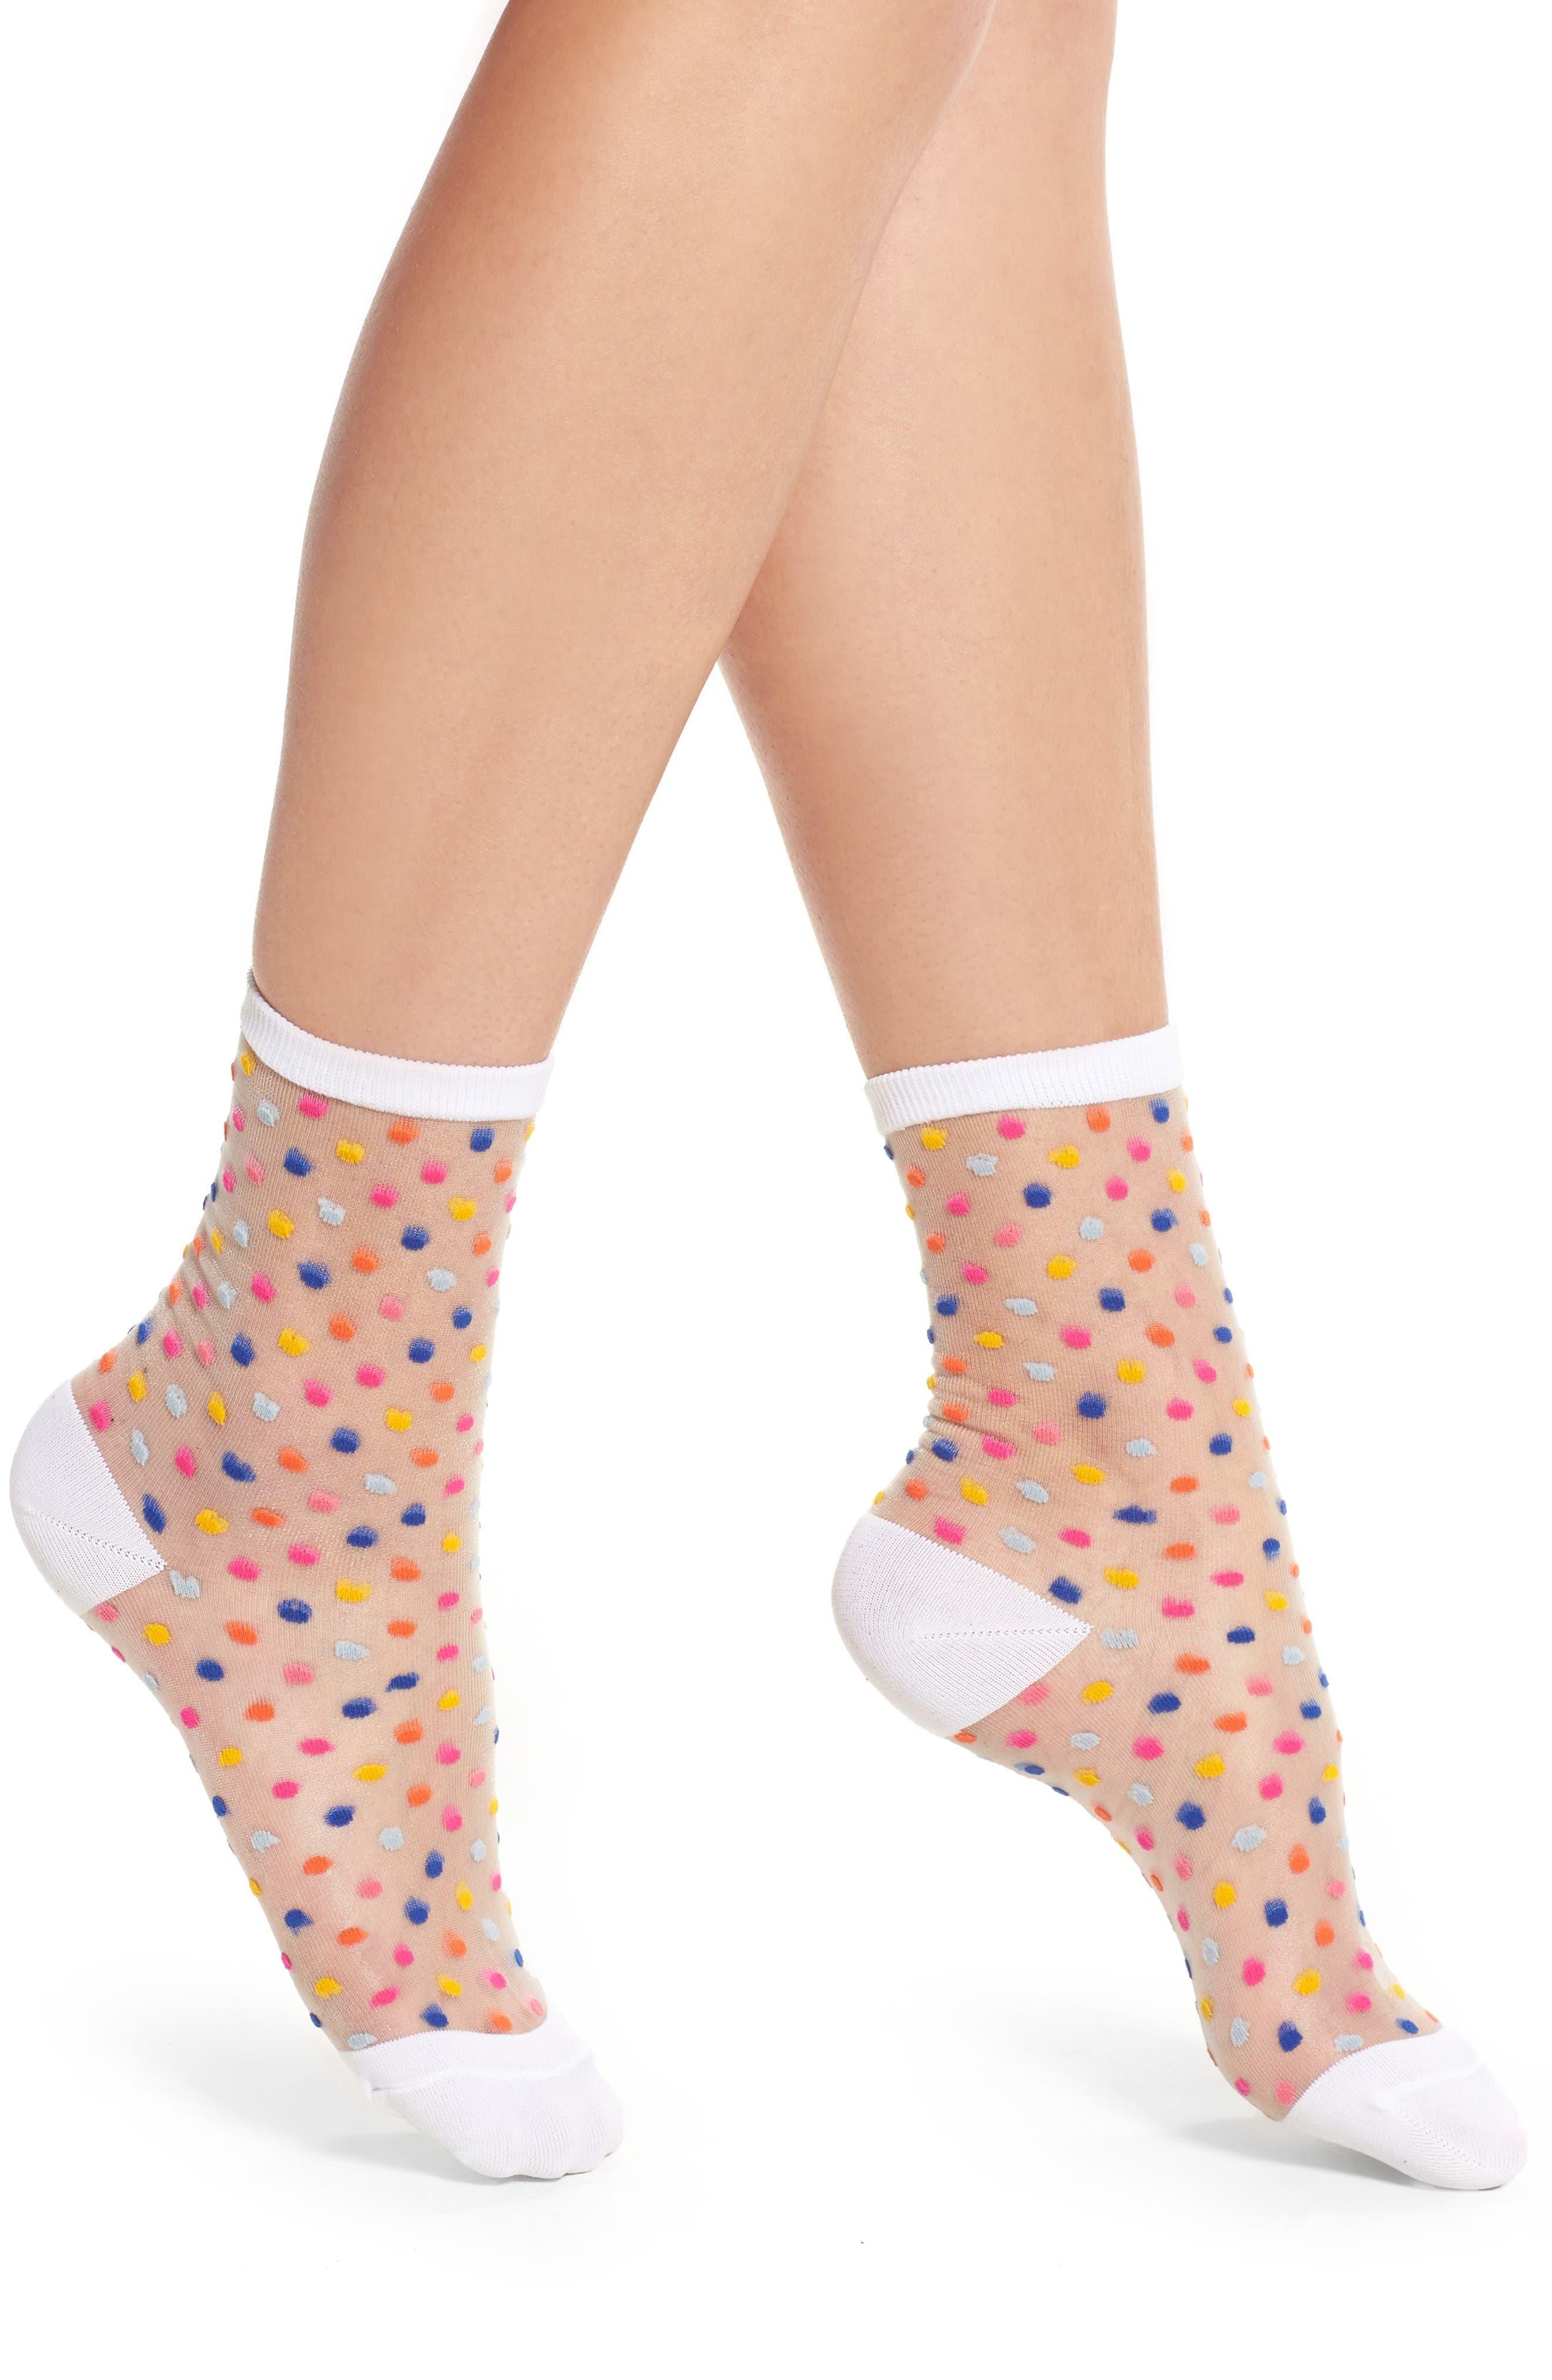 trouser socks,                             Main thumbnail 1, color,                             White